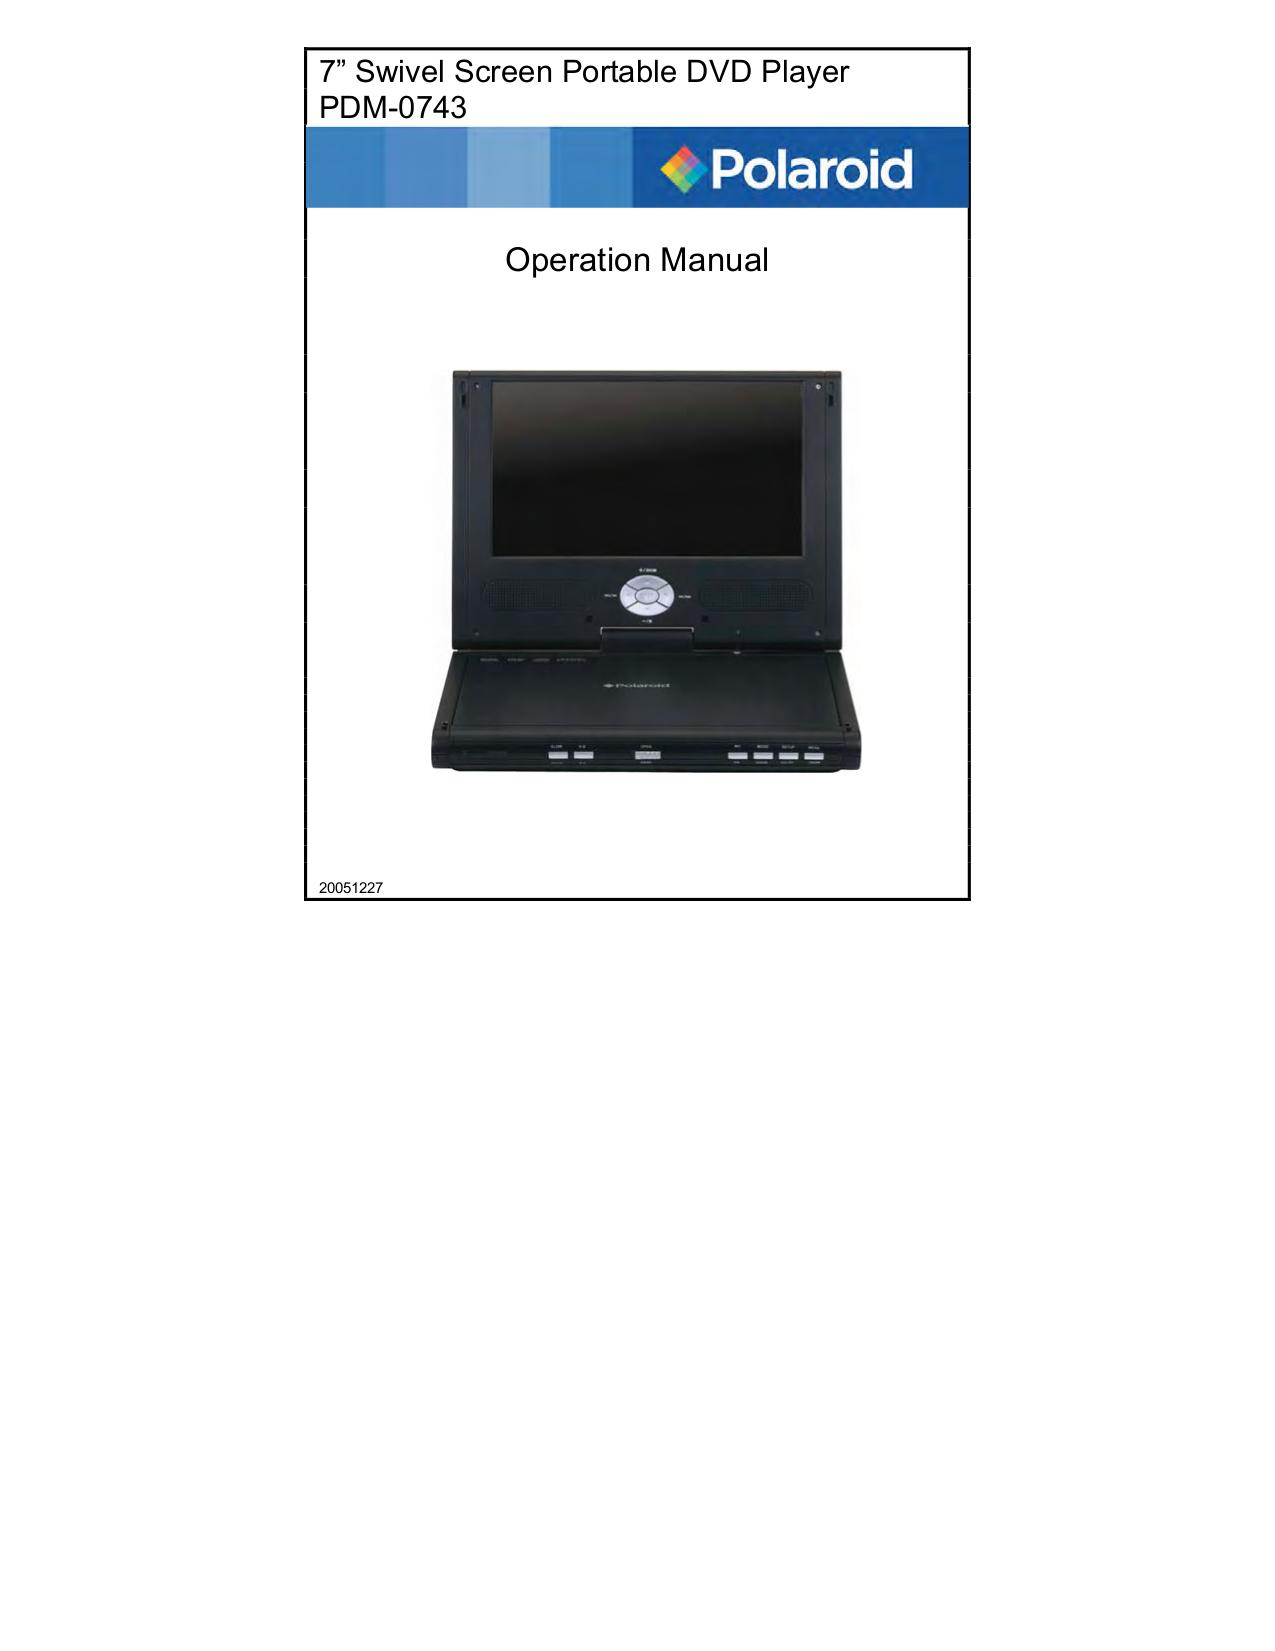 download free pdf for polaroid pdm 0743 portable dvd player manual rh umlib com Polaroid Portable DVD Player Amazon Polaroid Portable DVD Player PDM-0711 Lens